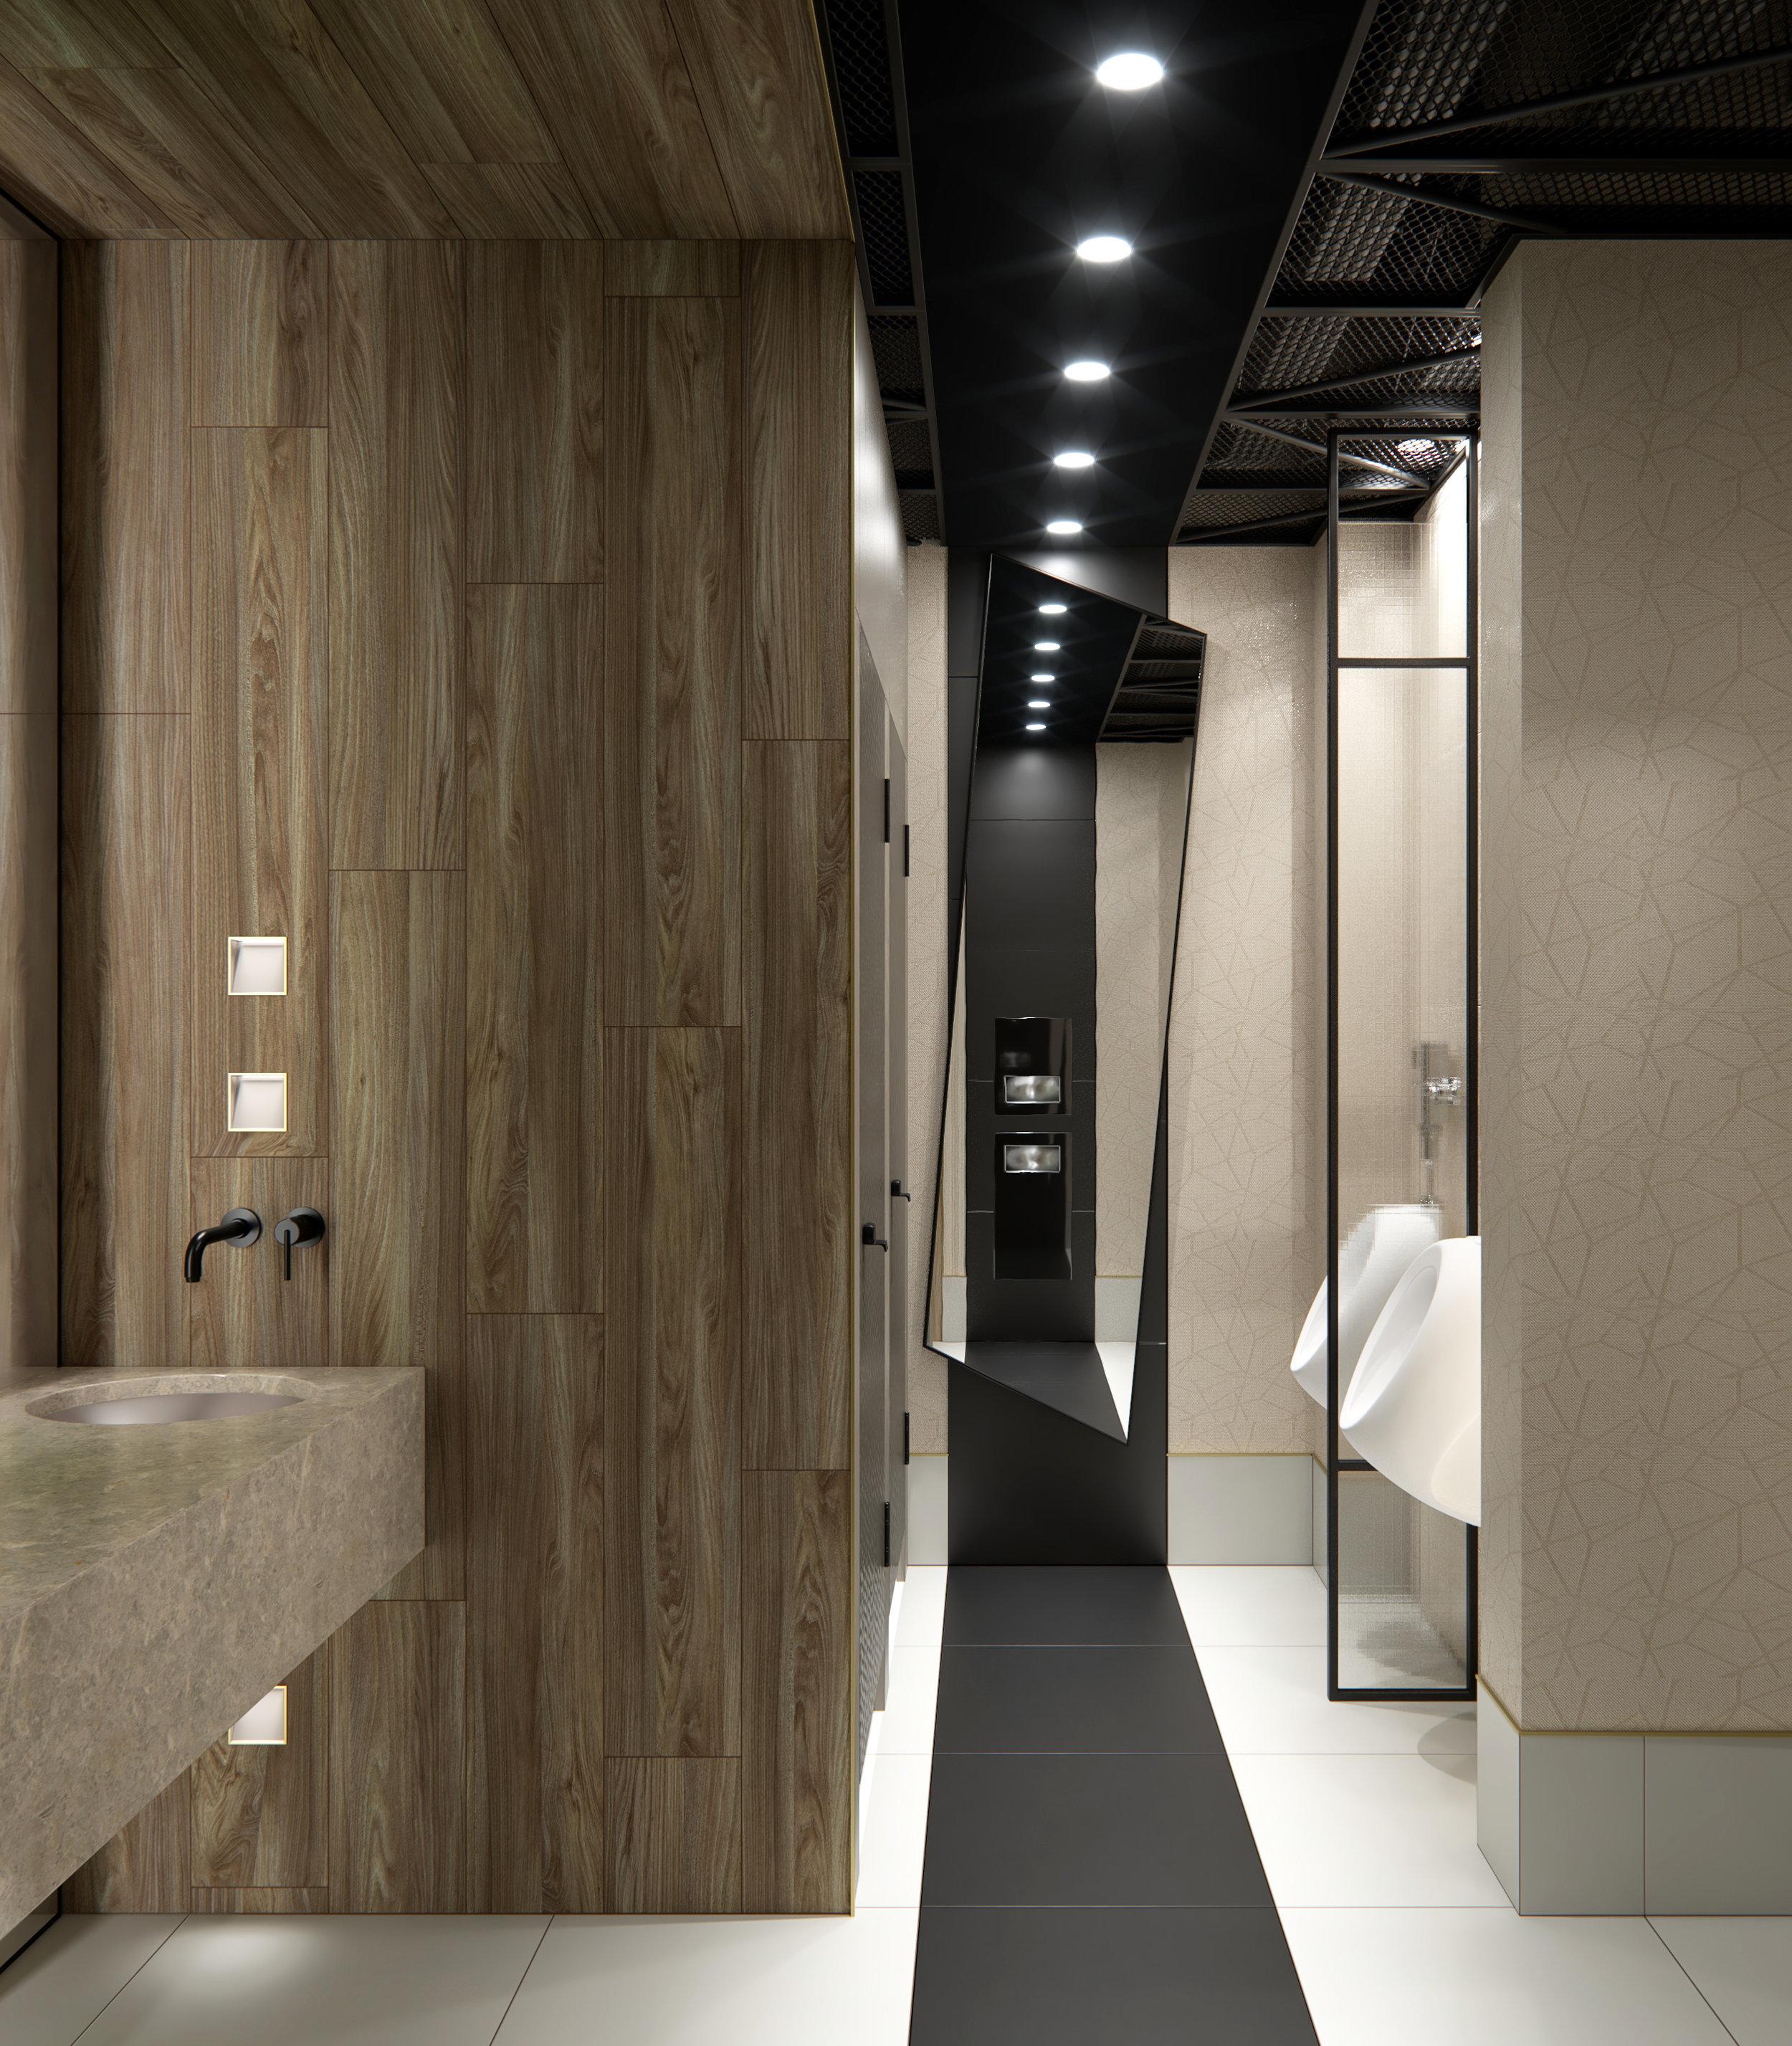 420 5TH AVENUE PUBLIC BATHROOM - MEN - 2.jpg